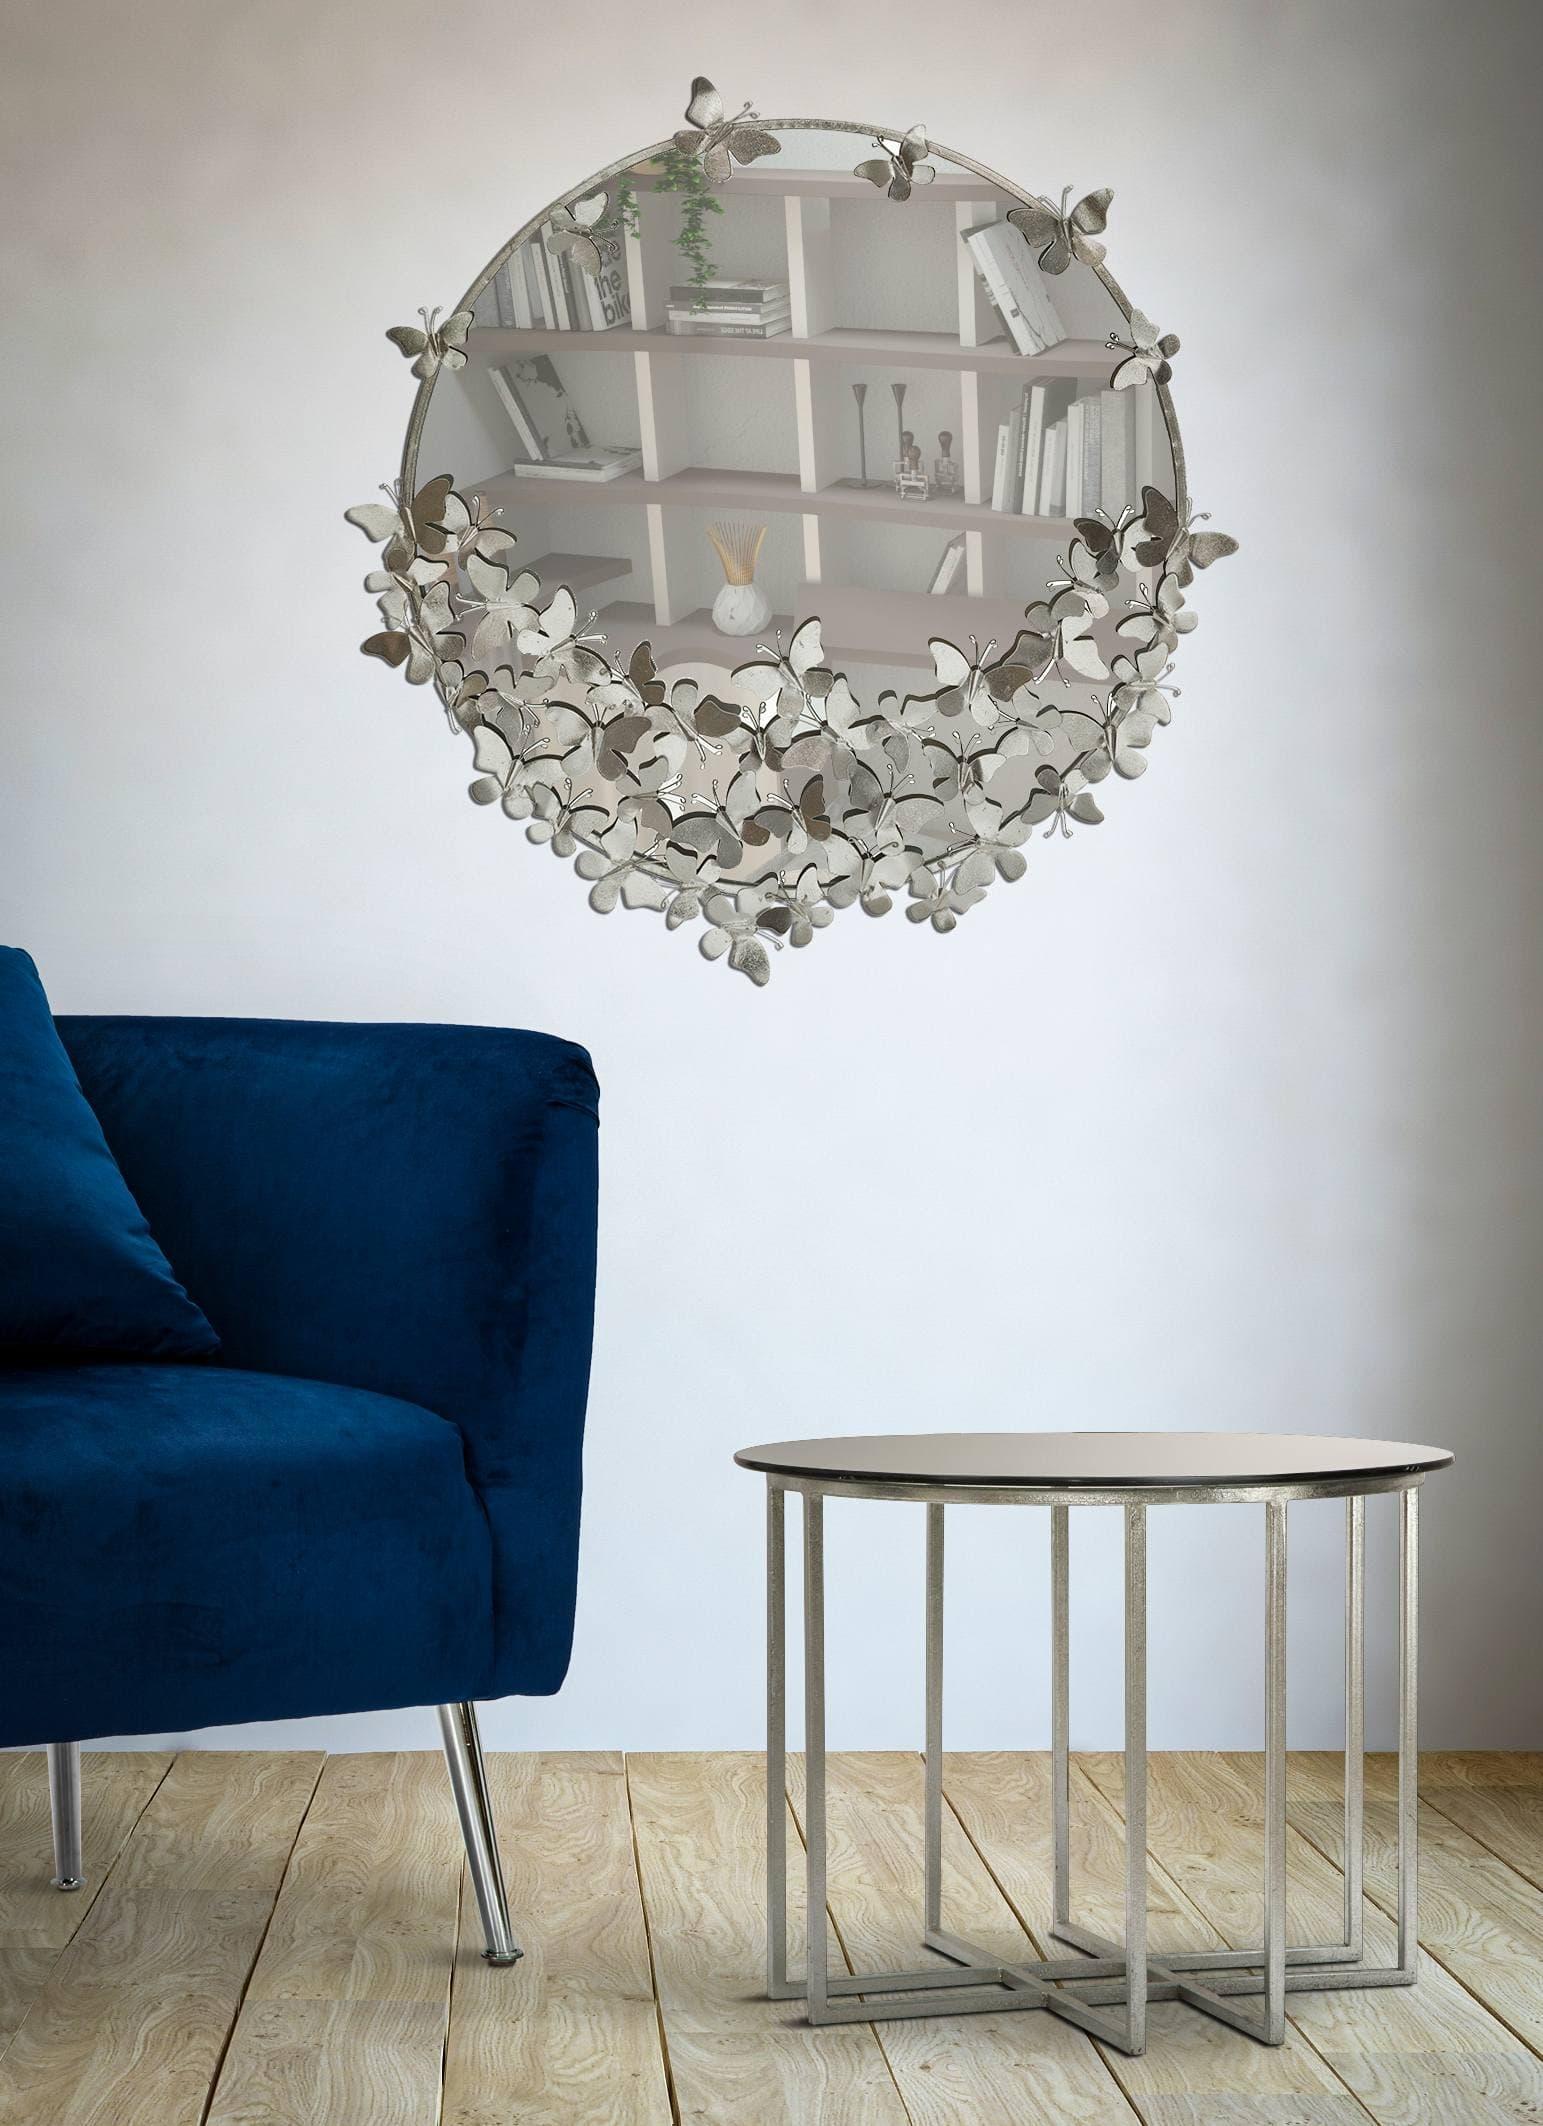 Oglinda decorativa din metal Butterfly Argintiu, Ø91 cm imagine